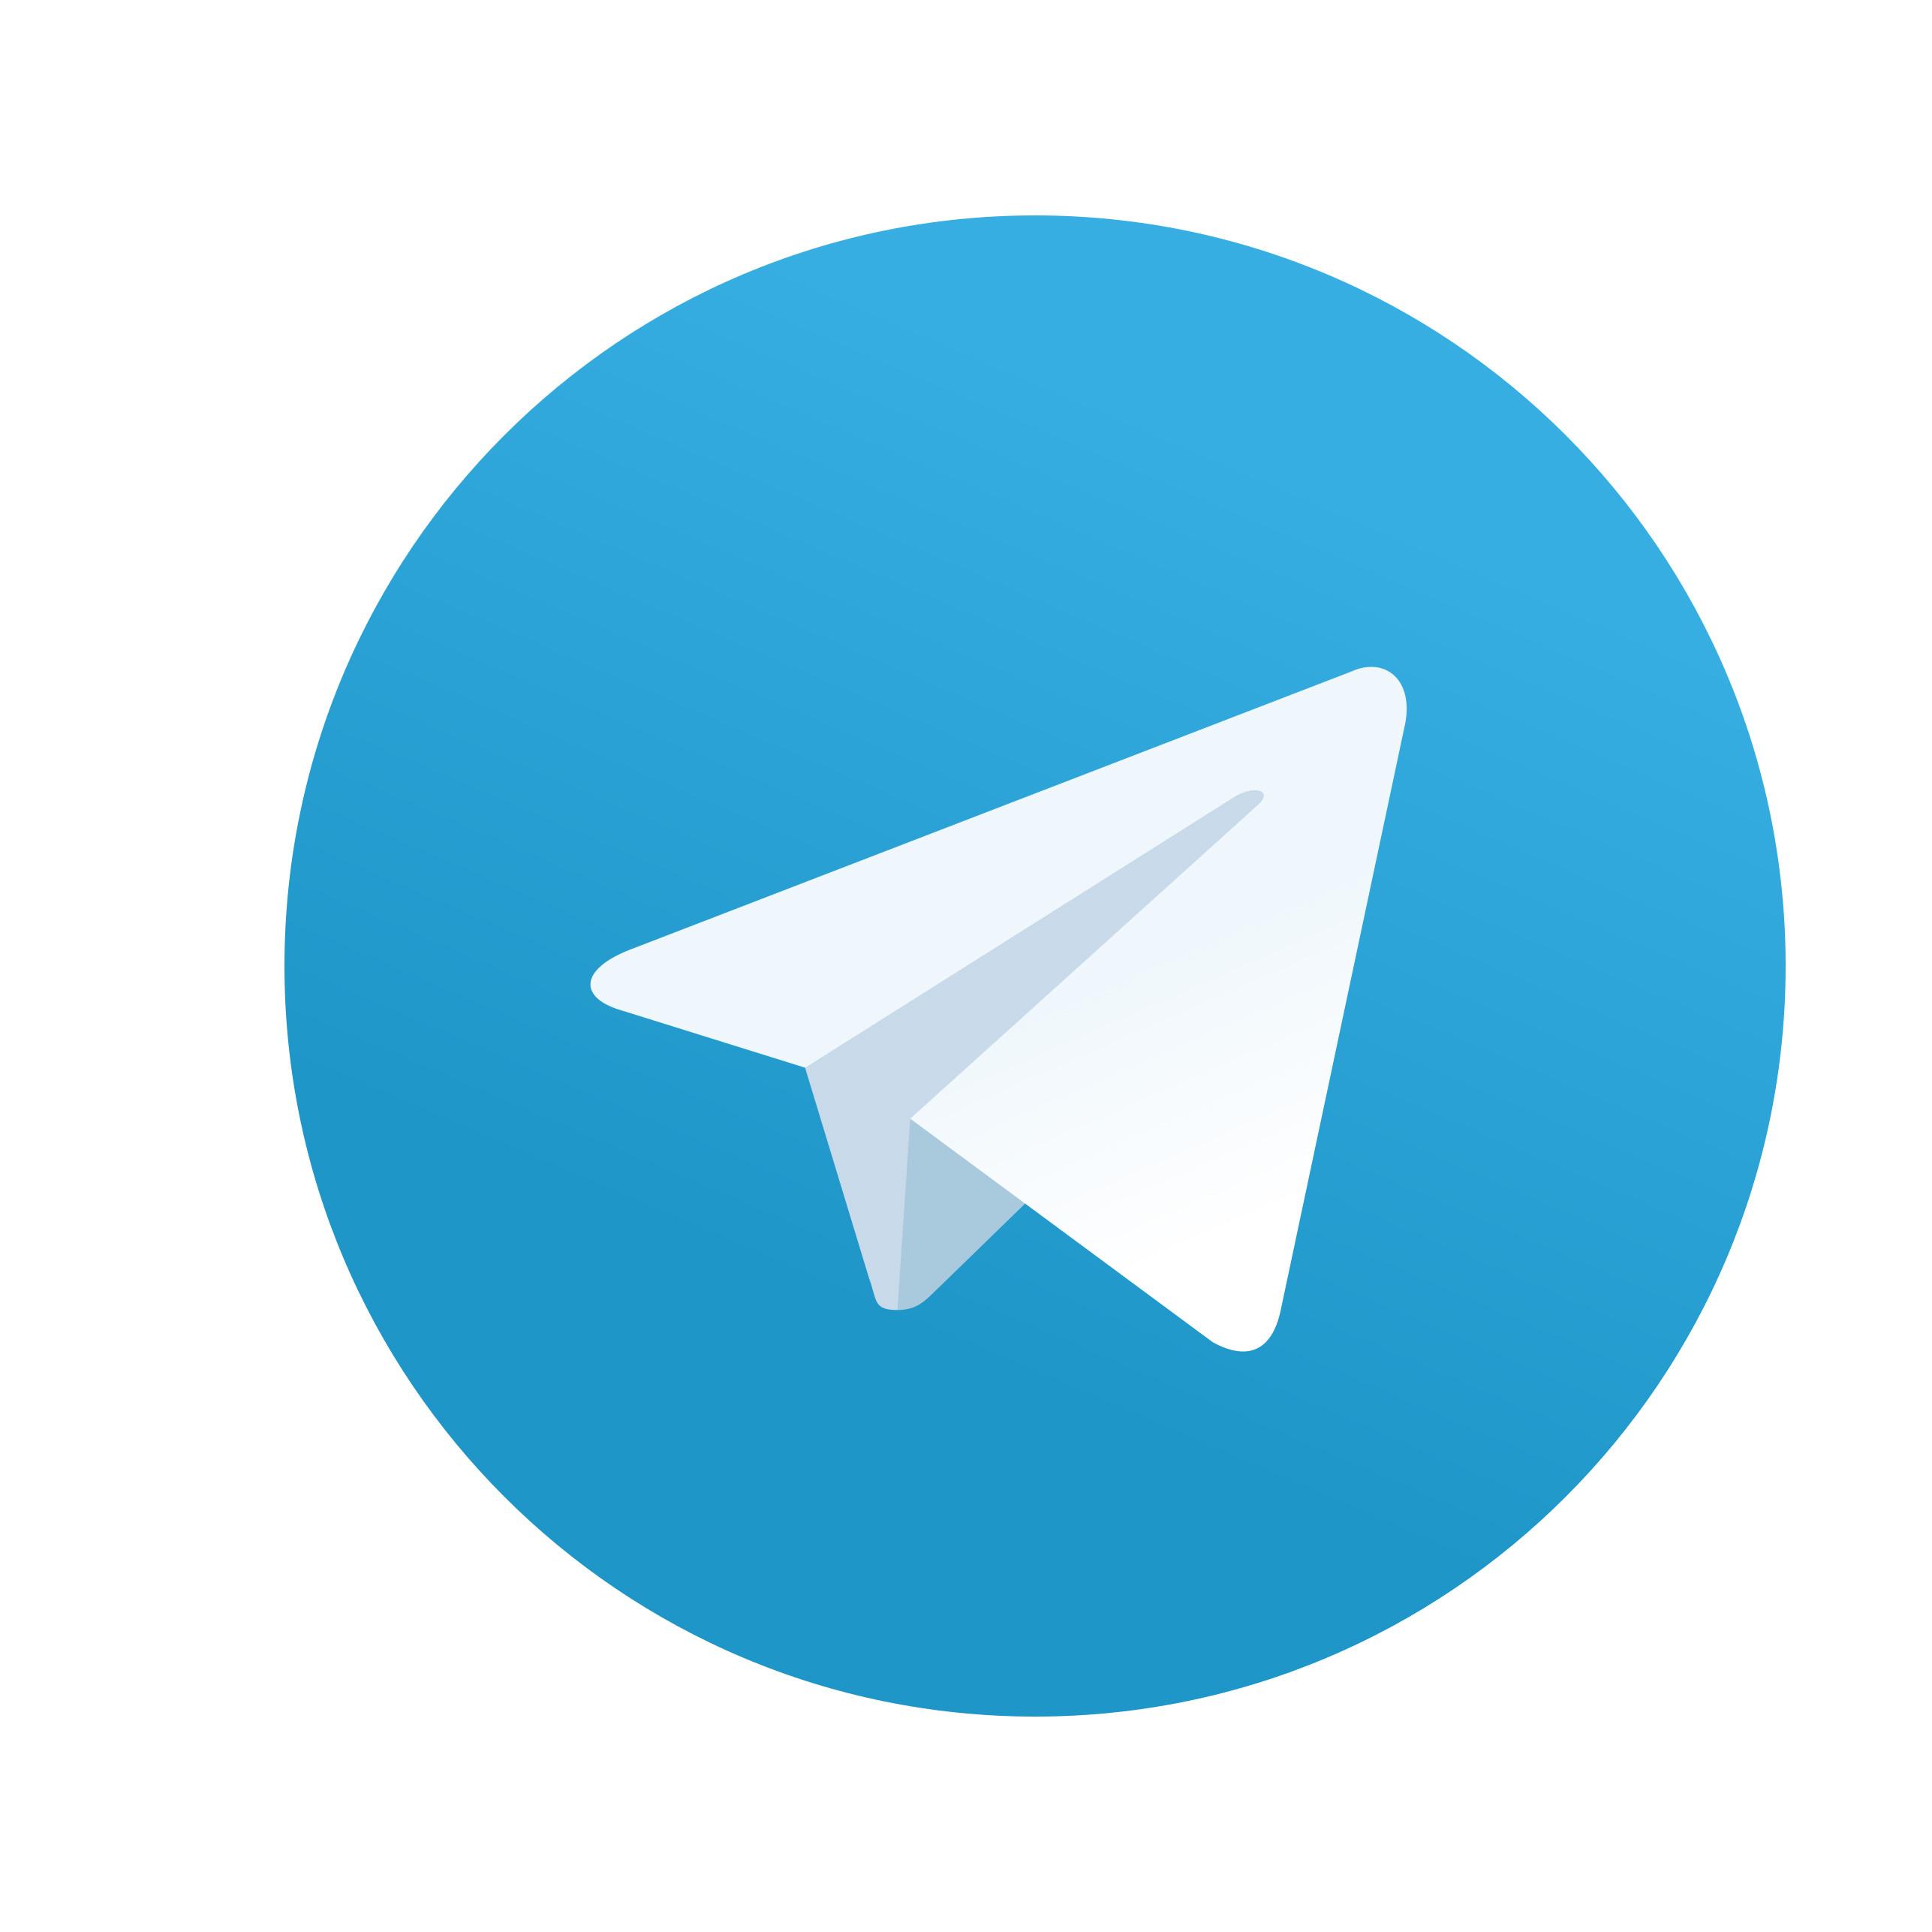 Месье Шар связь через Telegram